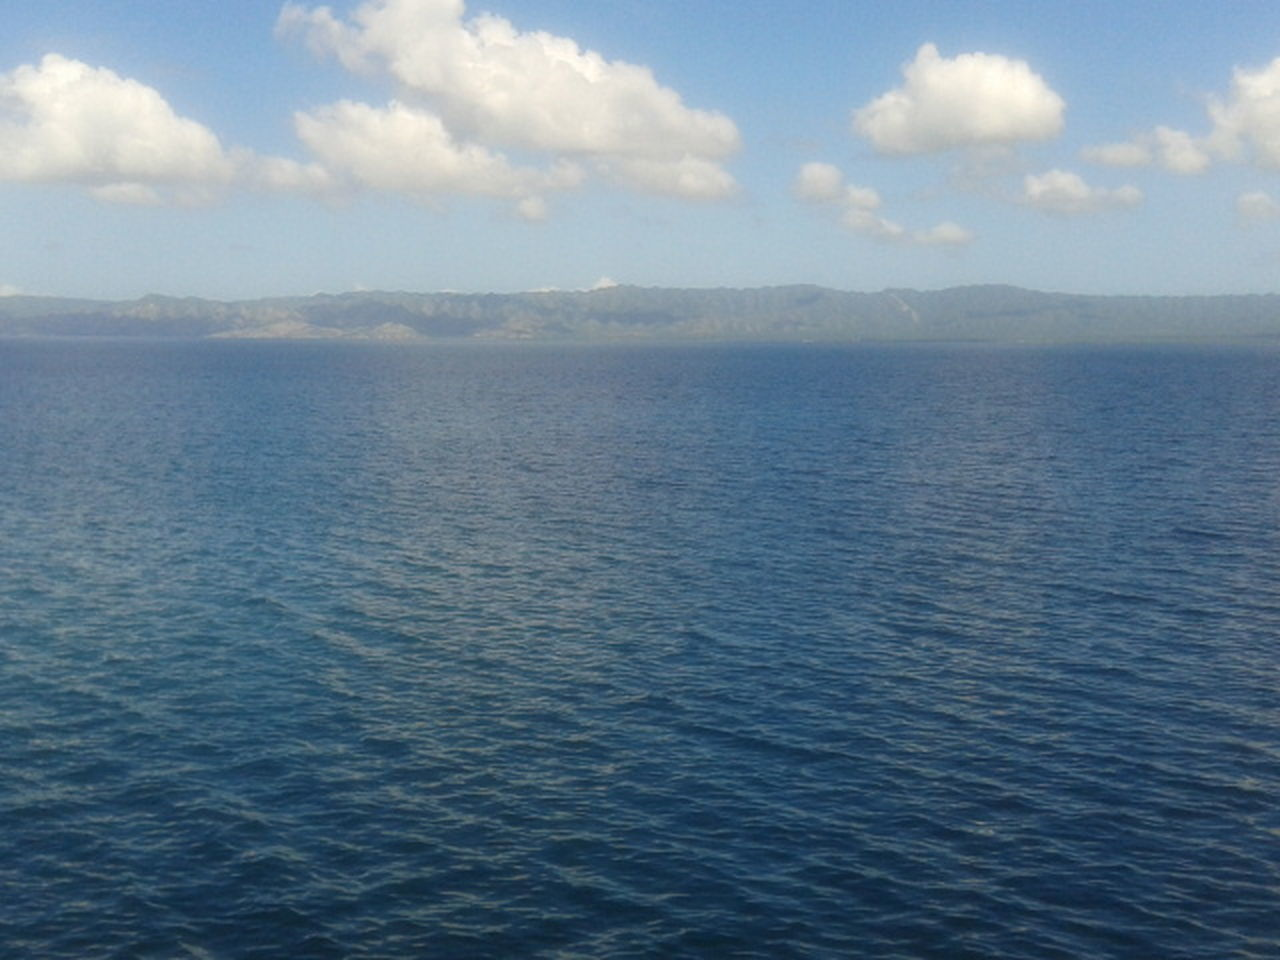 Cloud - Sky Nature Sea Tranquility Beauty In Nature Water Horizon Over Water Mochima Venezuela EyeEmNewHere The Great Outdoors - 2017 EyeEm Awards